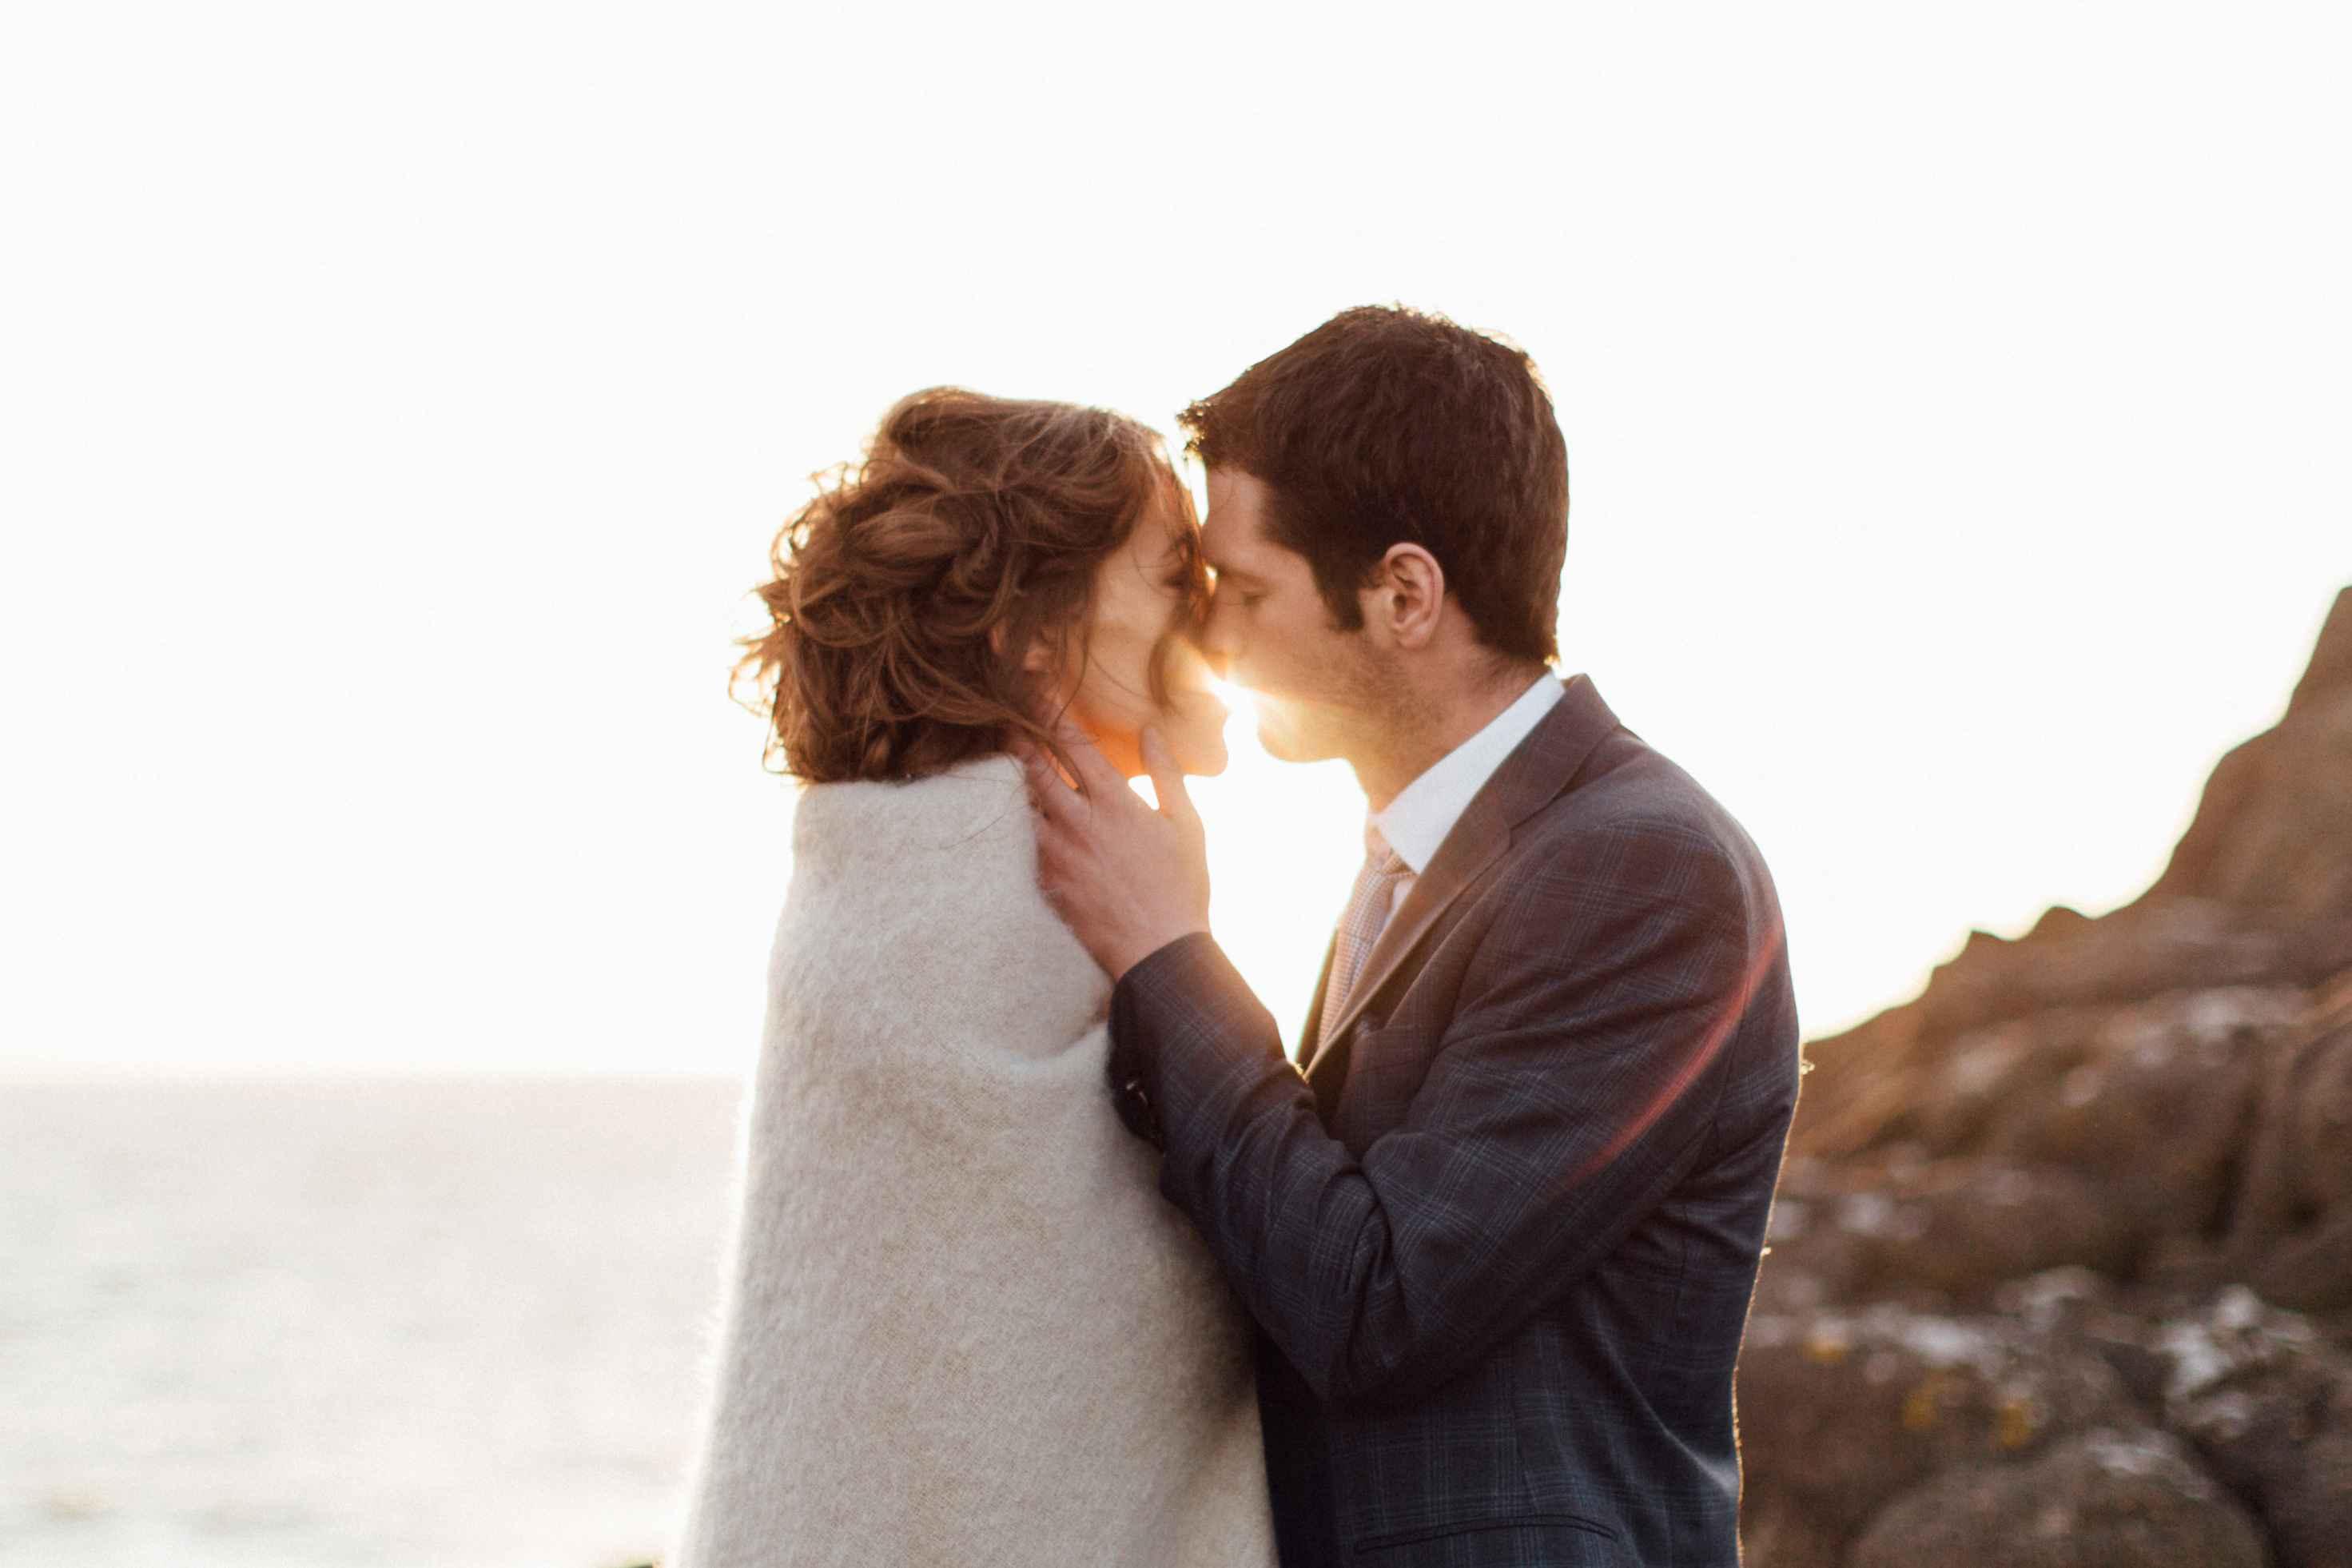 peter-carvill-weddings-fine-art-white-rocks-beach_0182